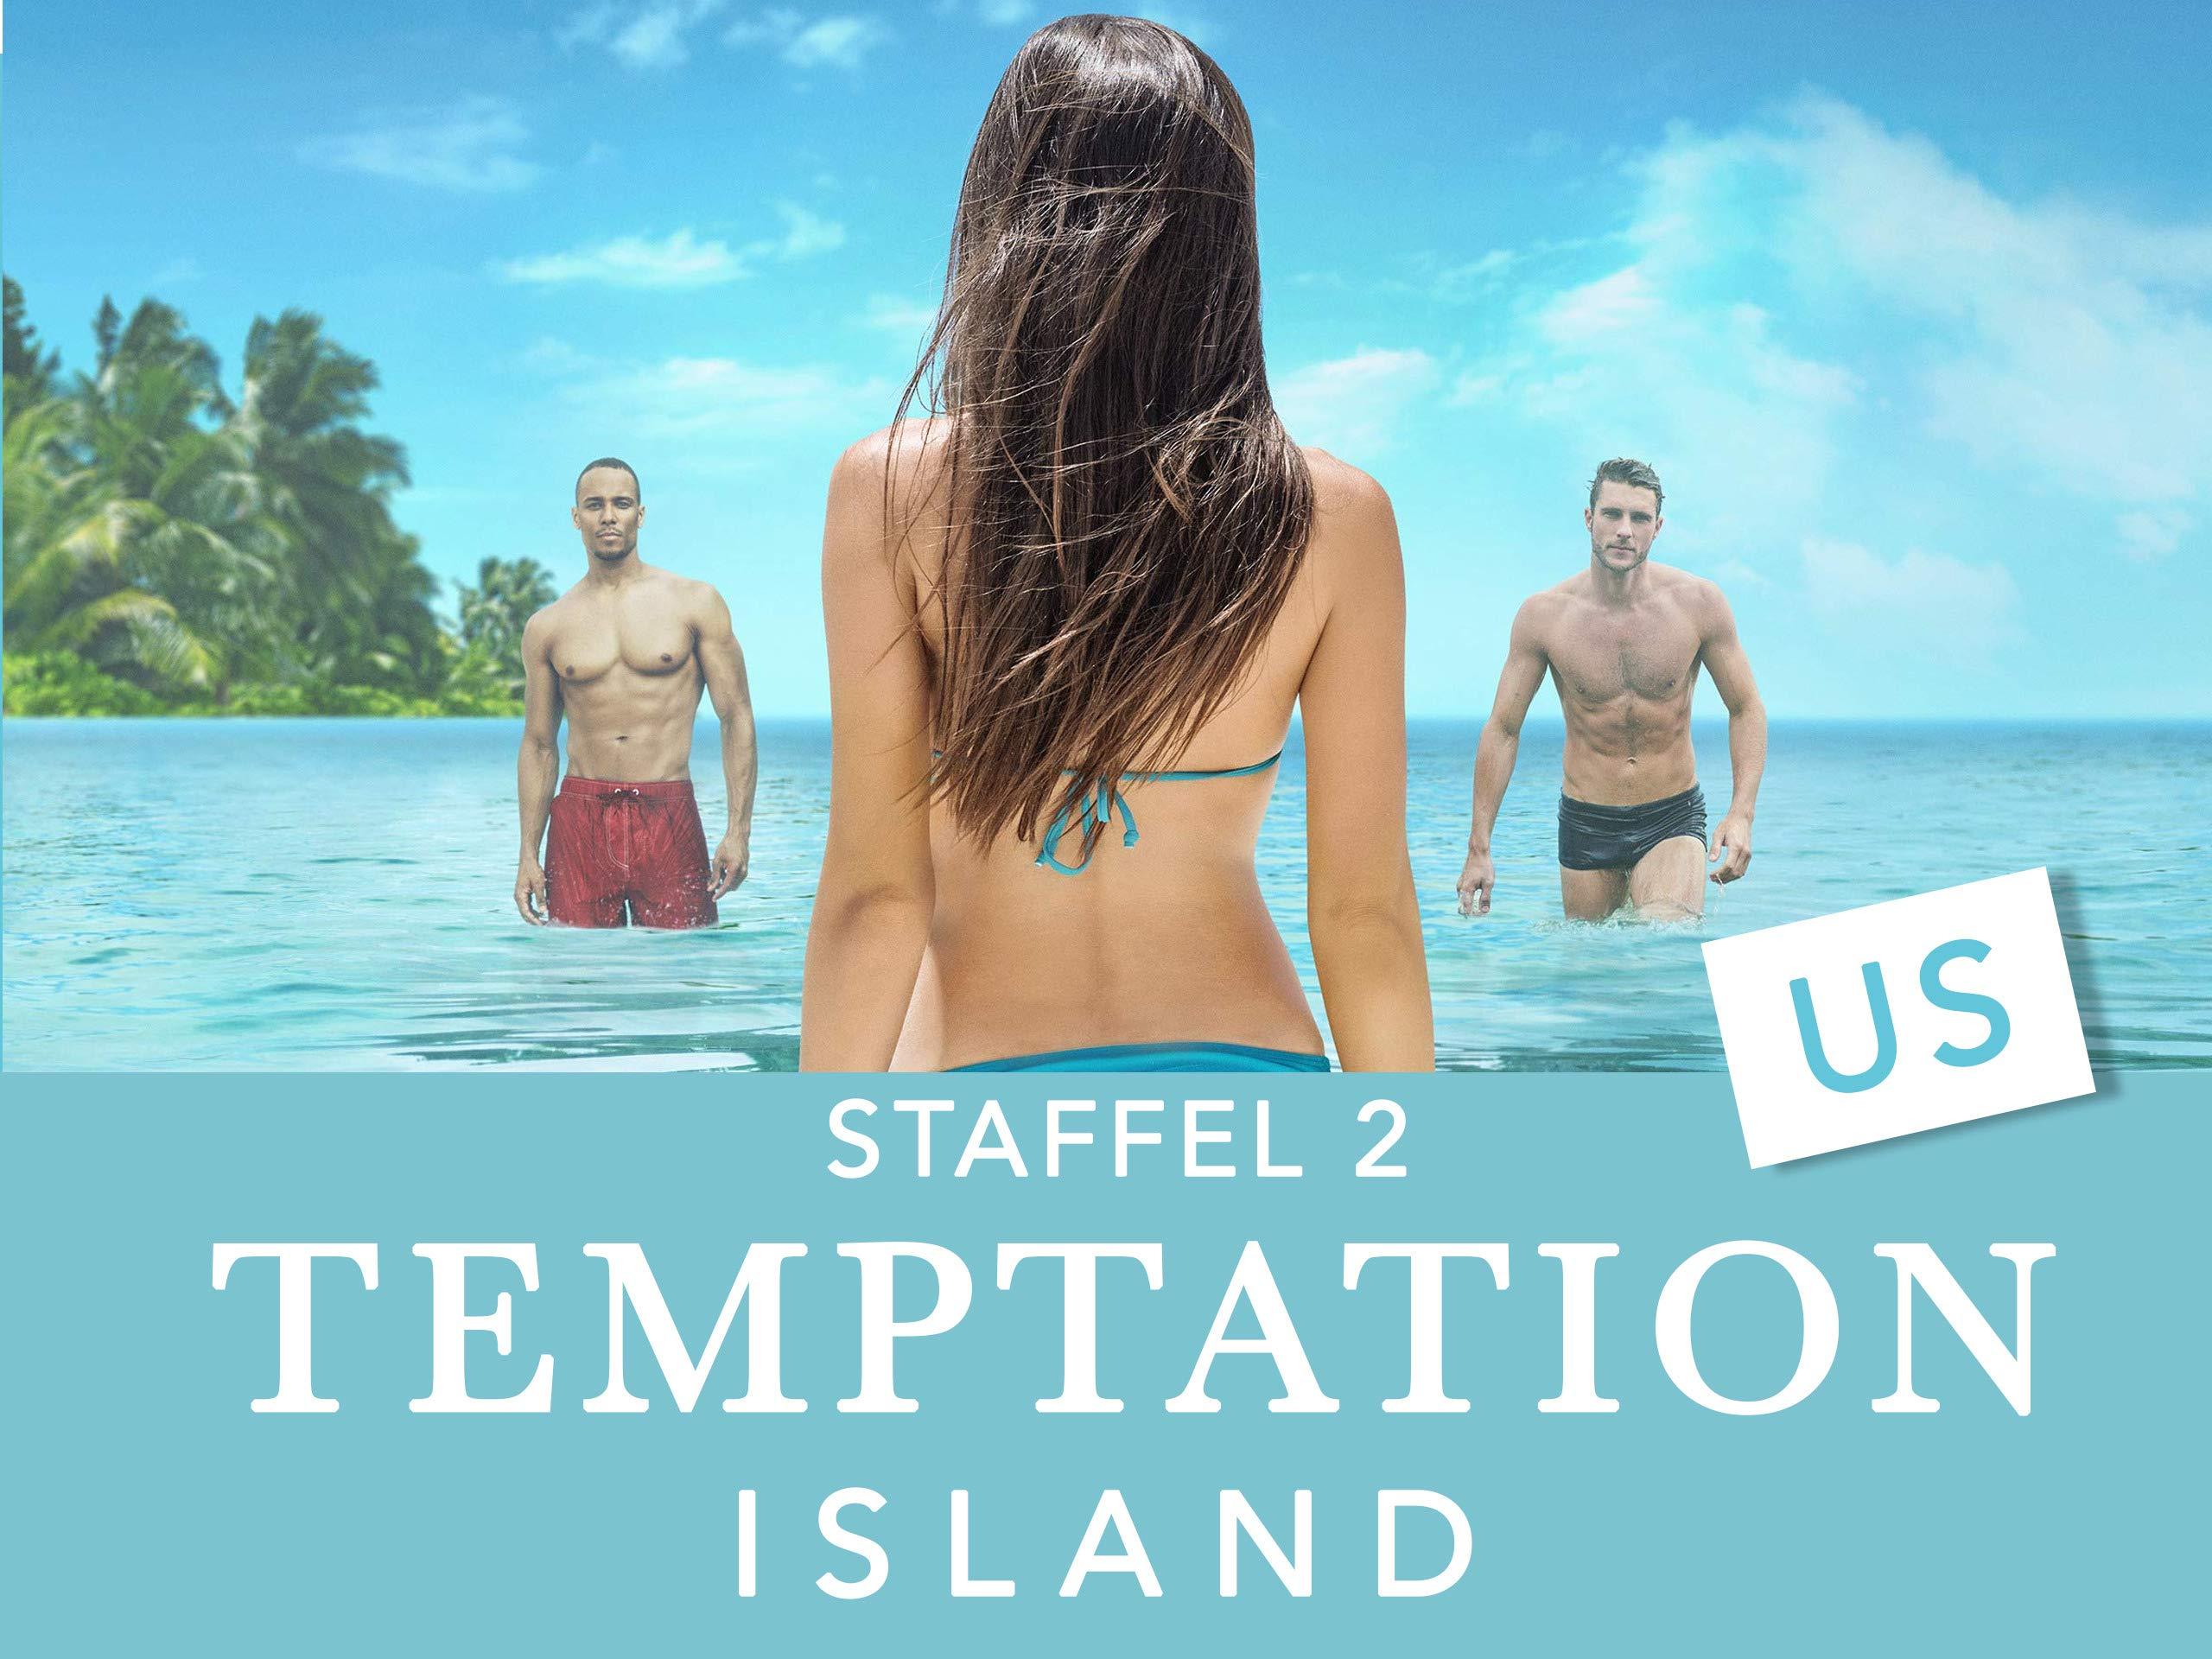 Temptation Island Rtl Castet Hier Furs Dschungelcamp Mopo De 4